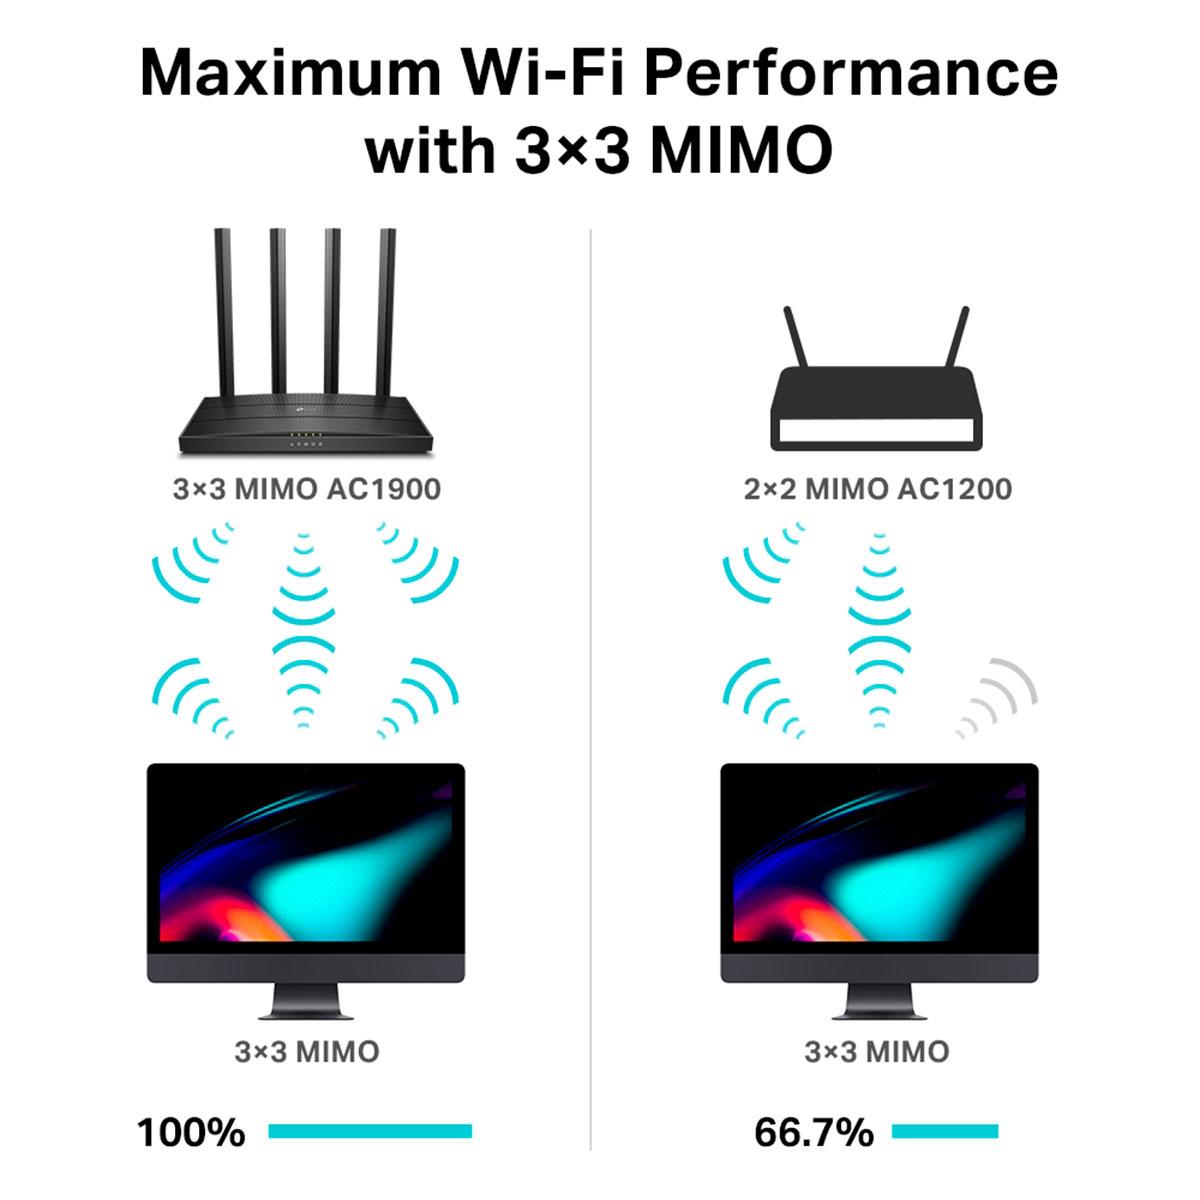 Roteador Wireless TP-Link Archer C80, Dual Band (2.4Ghz/5Ghz), AC1900, Gigabit, 4 Antenas Fixas